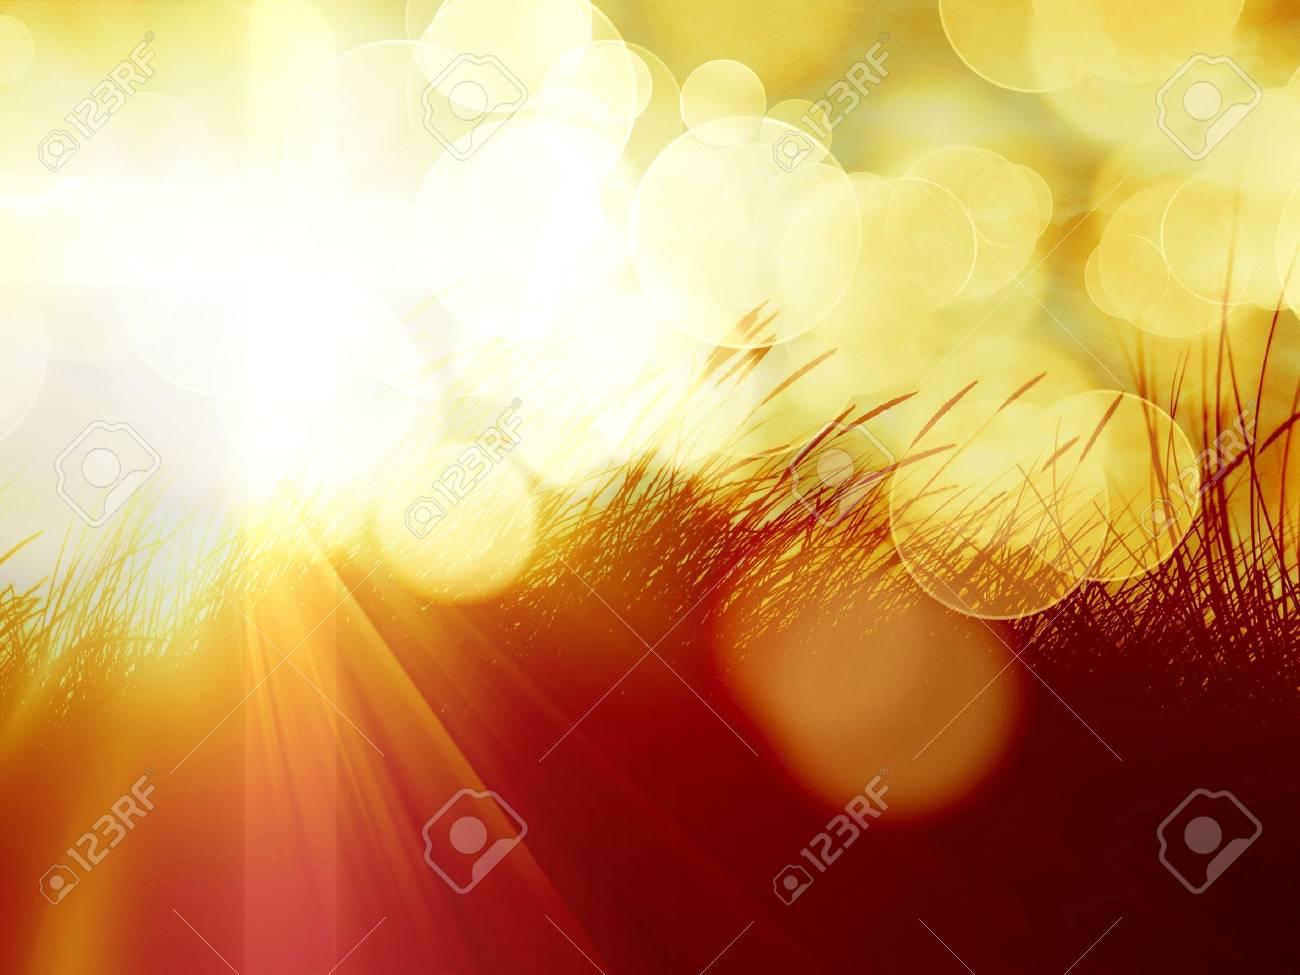 marram grass with an orange sky above Stock Photo - 5957640